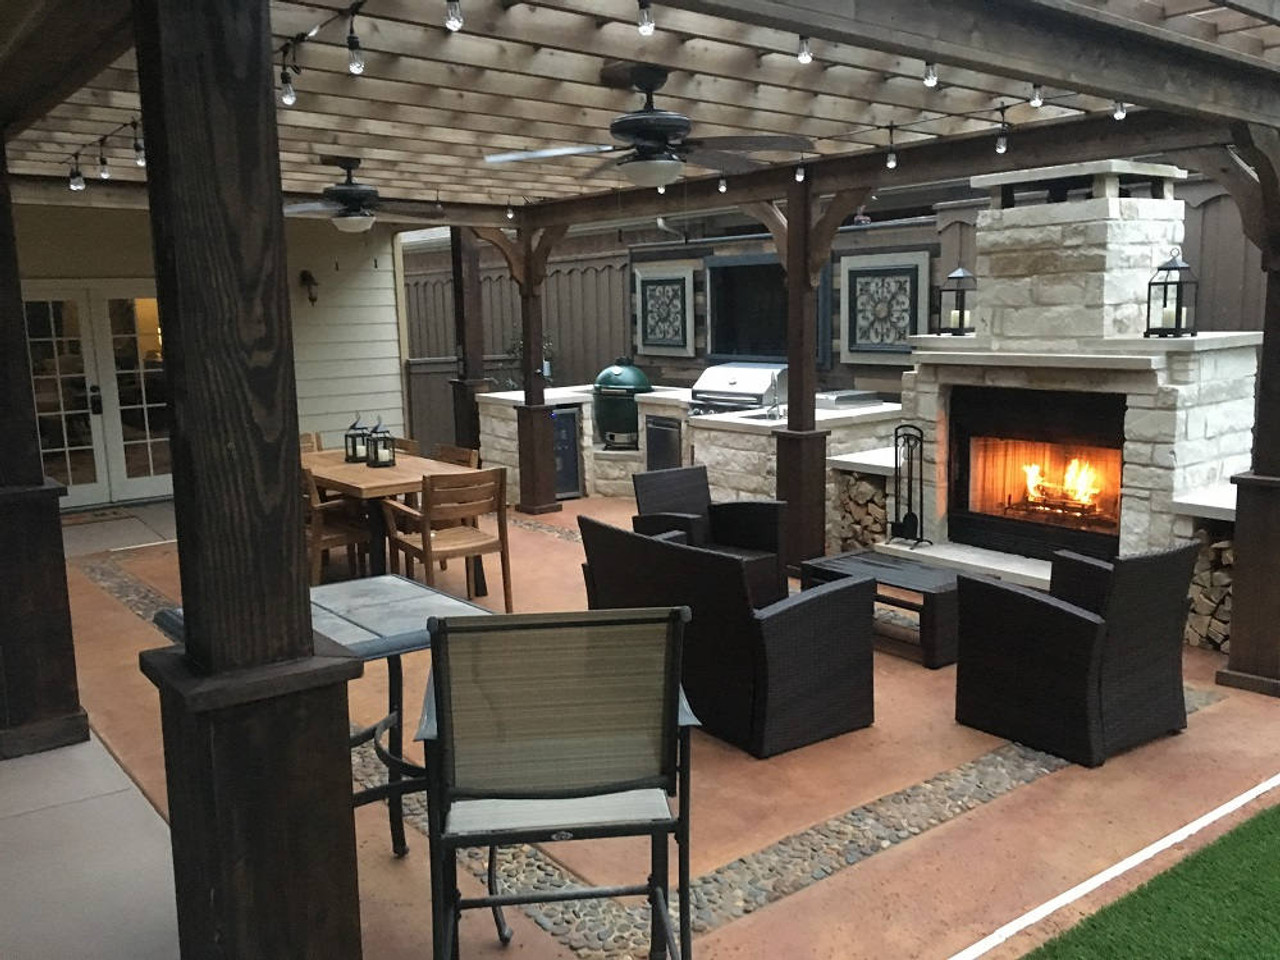 14x24 Serenity Cedar Pergola Kit Dallas TX Outdoor Fireplace & Kitchen